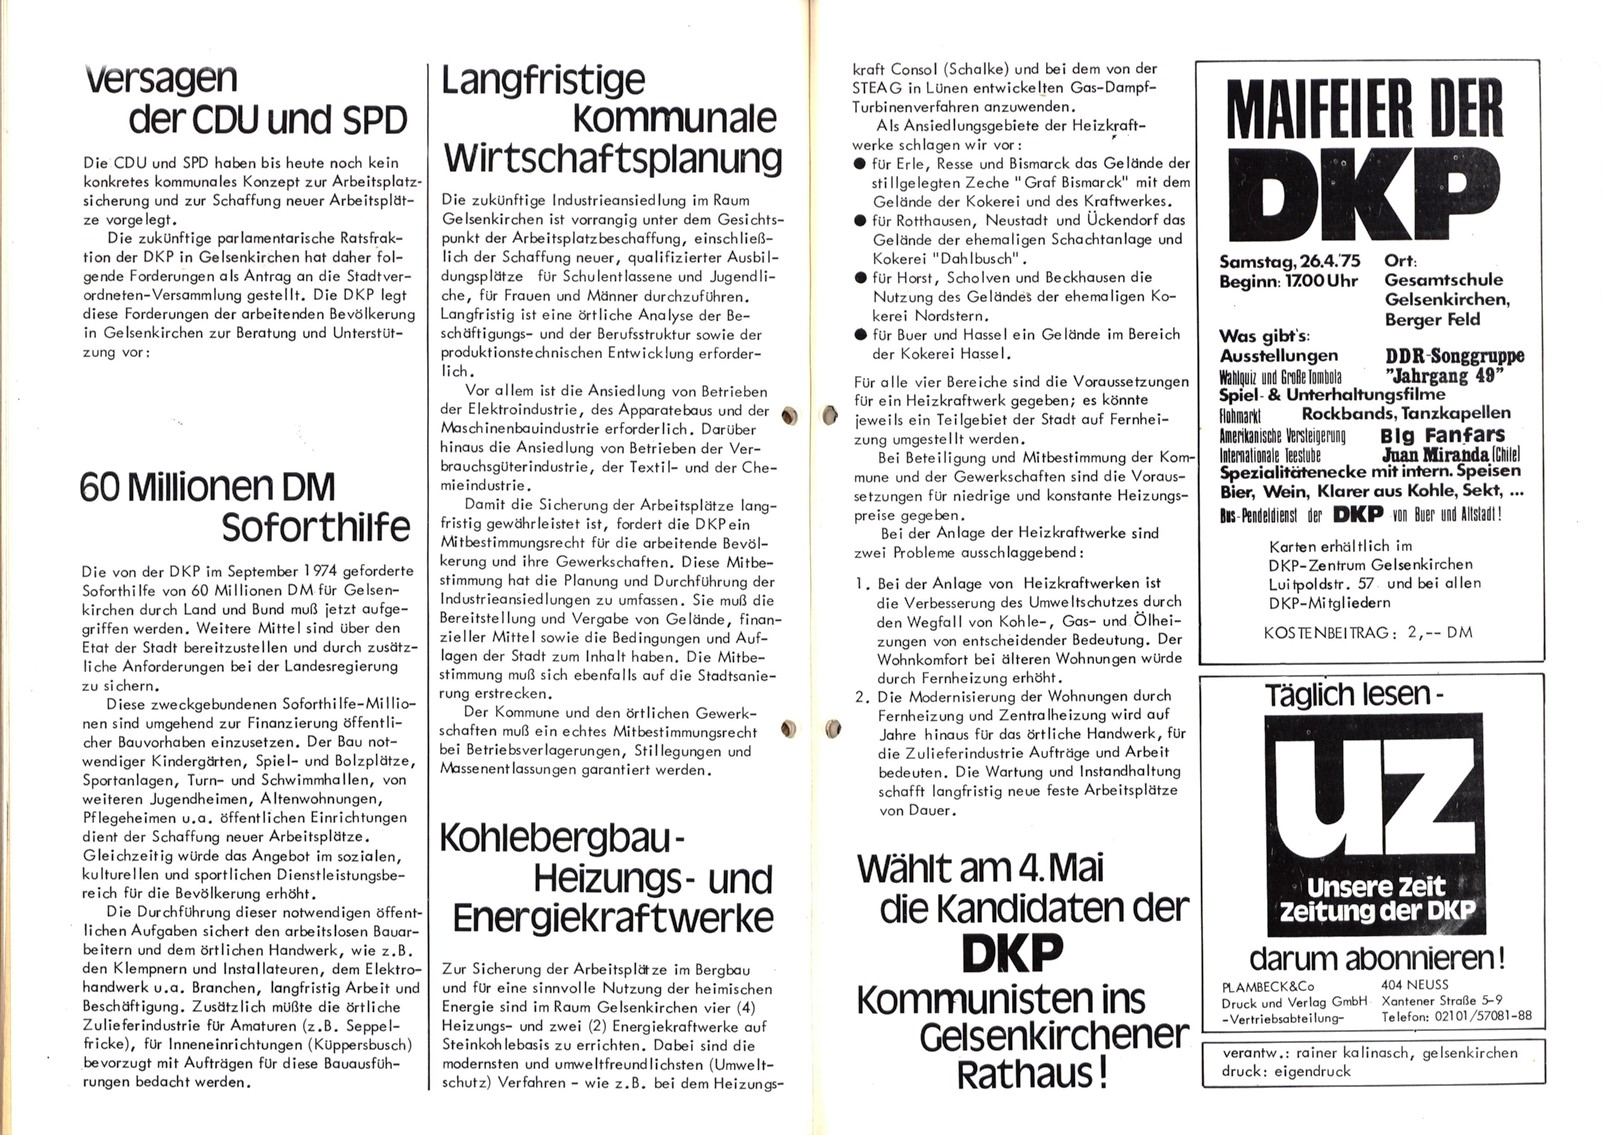 GE_DKP_Blechmacher_19750400_02